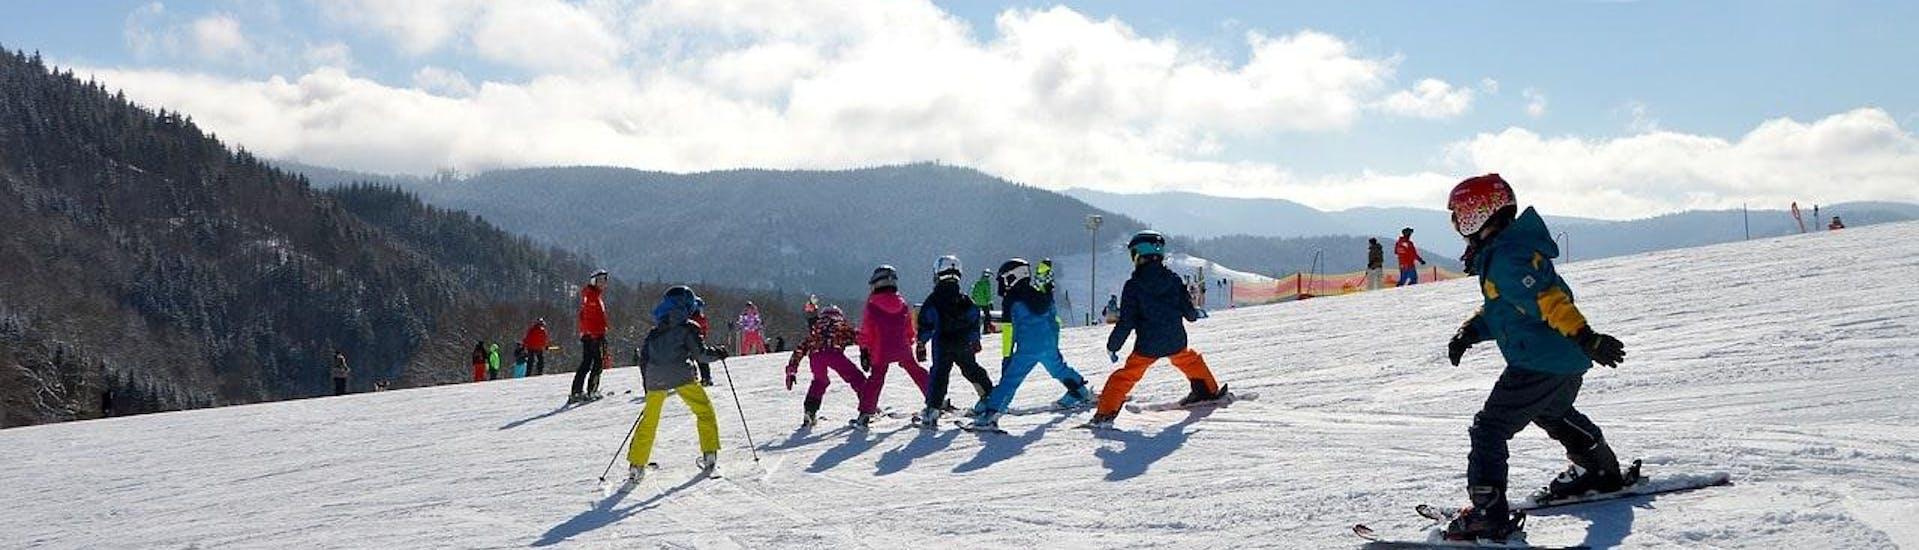 kids-ski-lessons-8-12-years-holiday-1st-timer-moonshot-hero